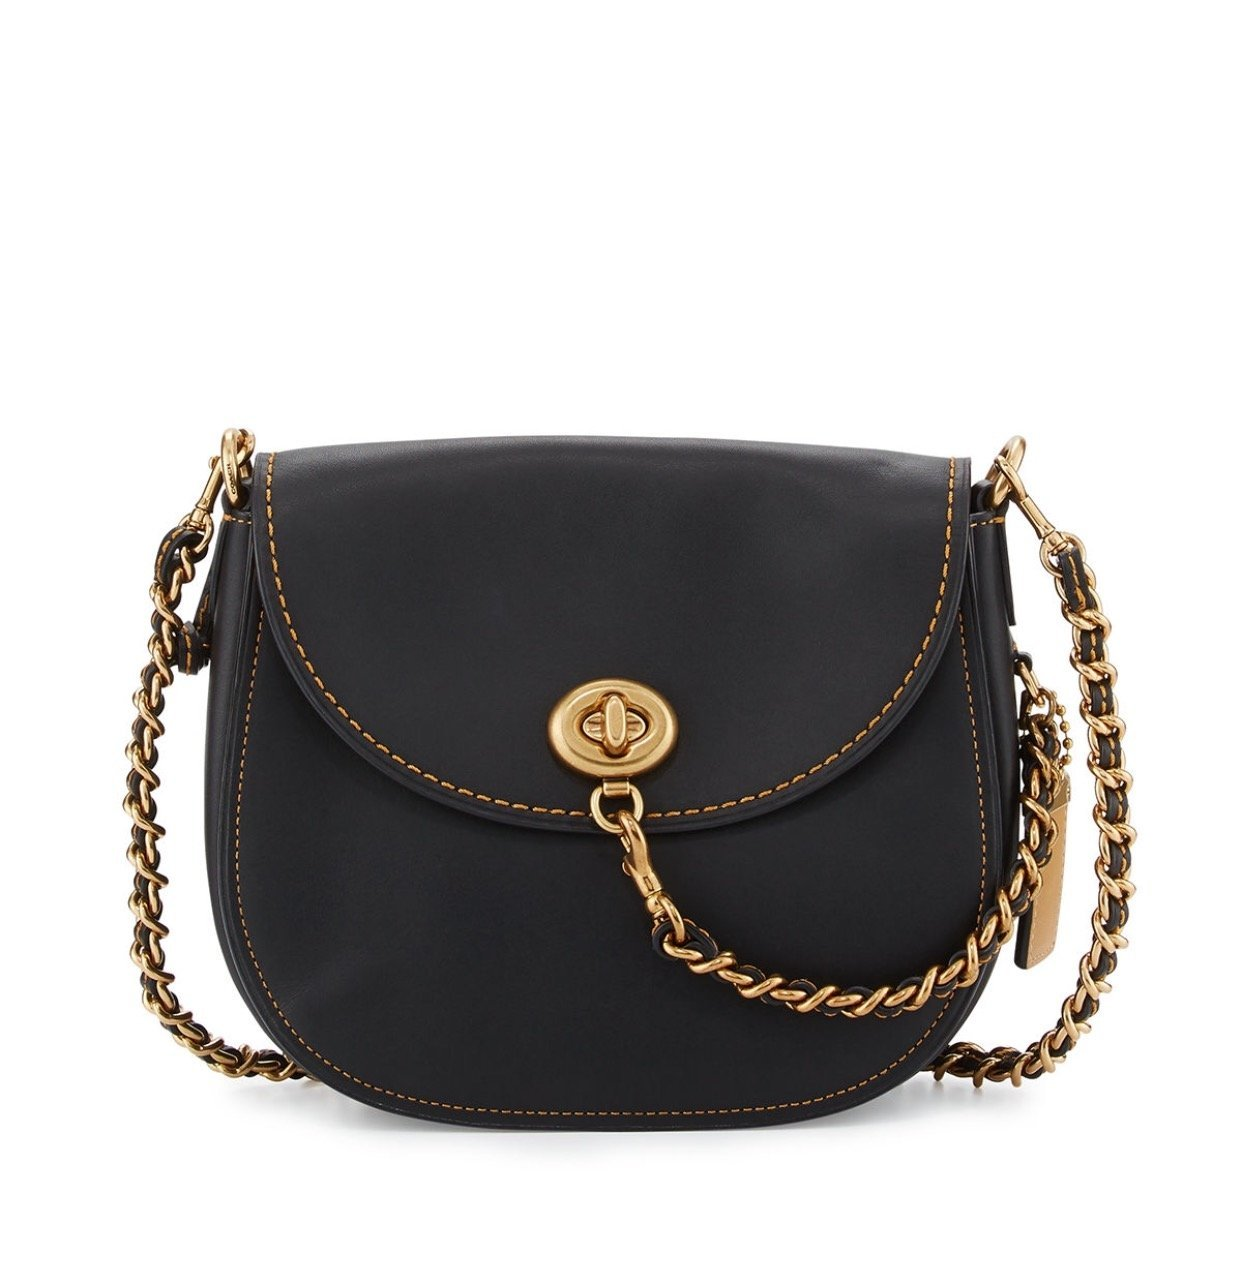 Coach 1941 Leather Turn-Lock Saddle Bag In Black Style 59241 $495